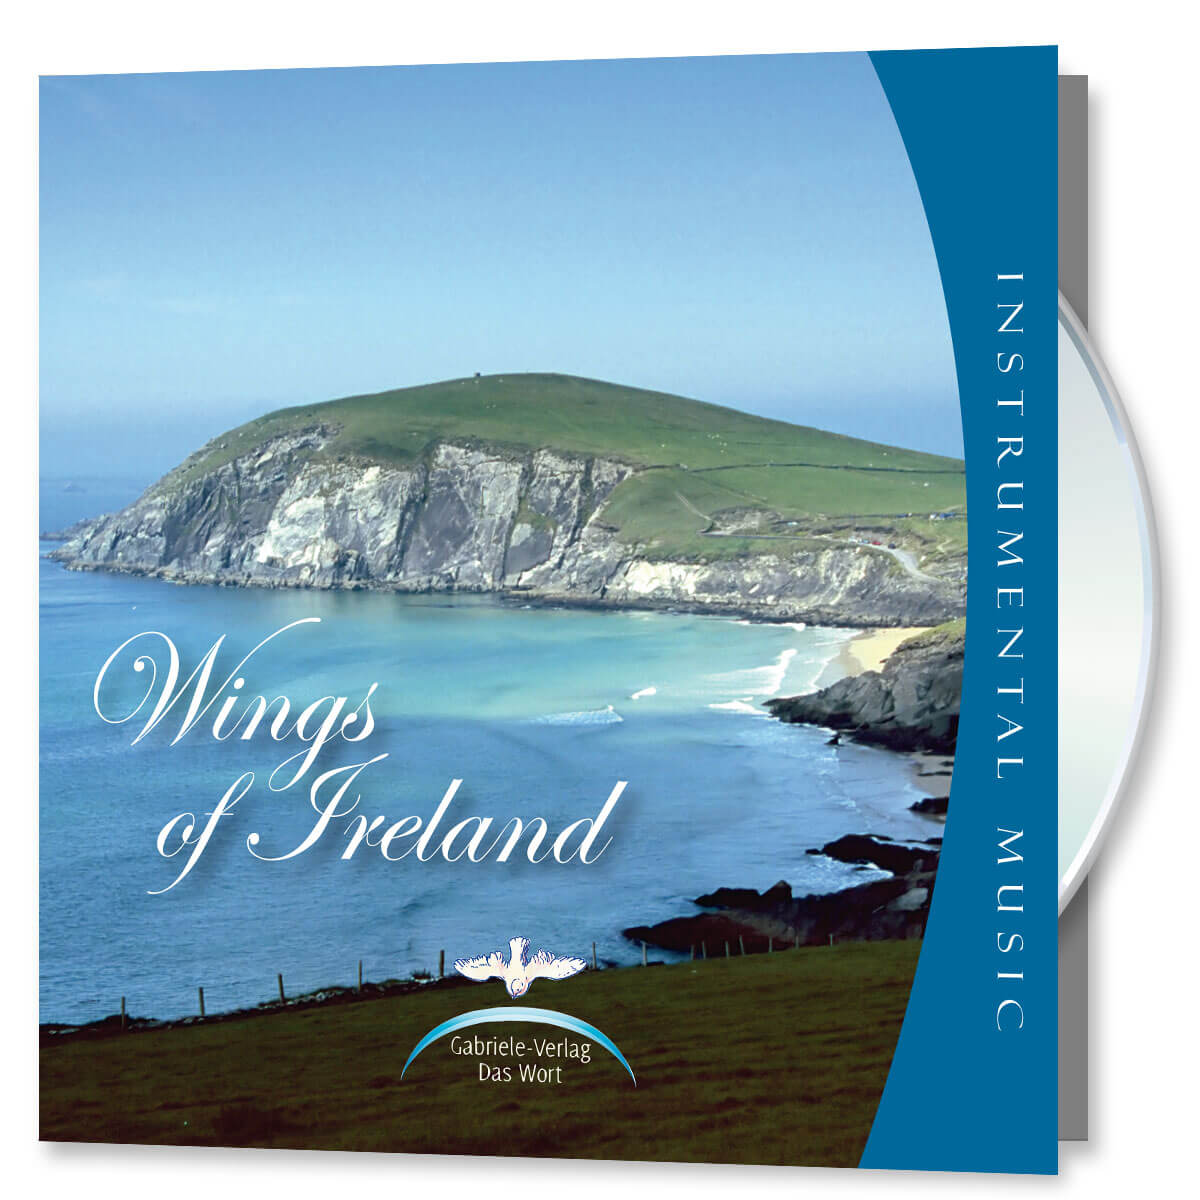 Wings of Ireland